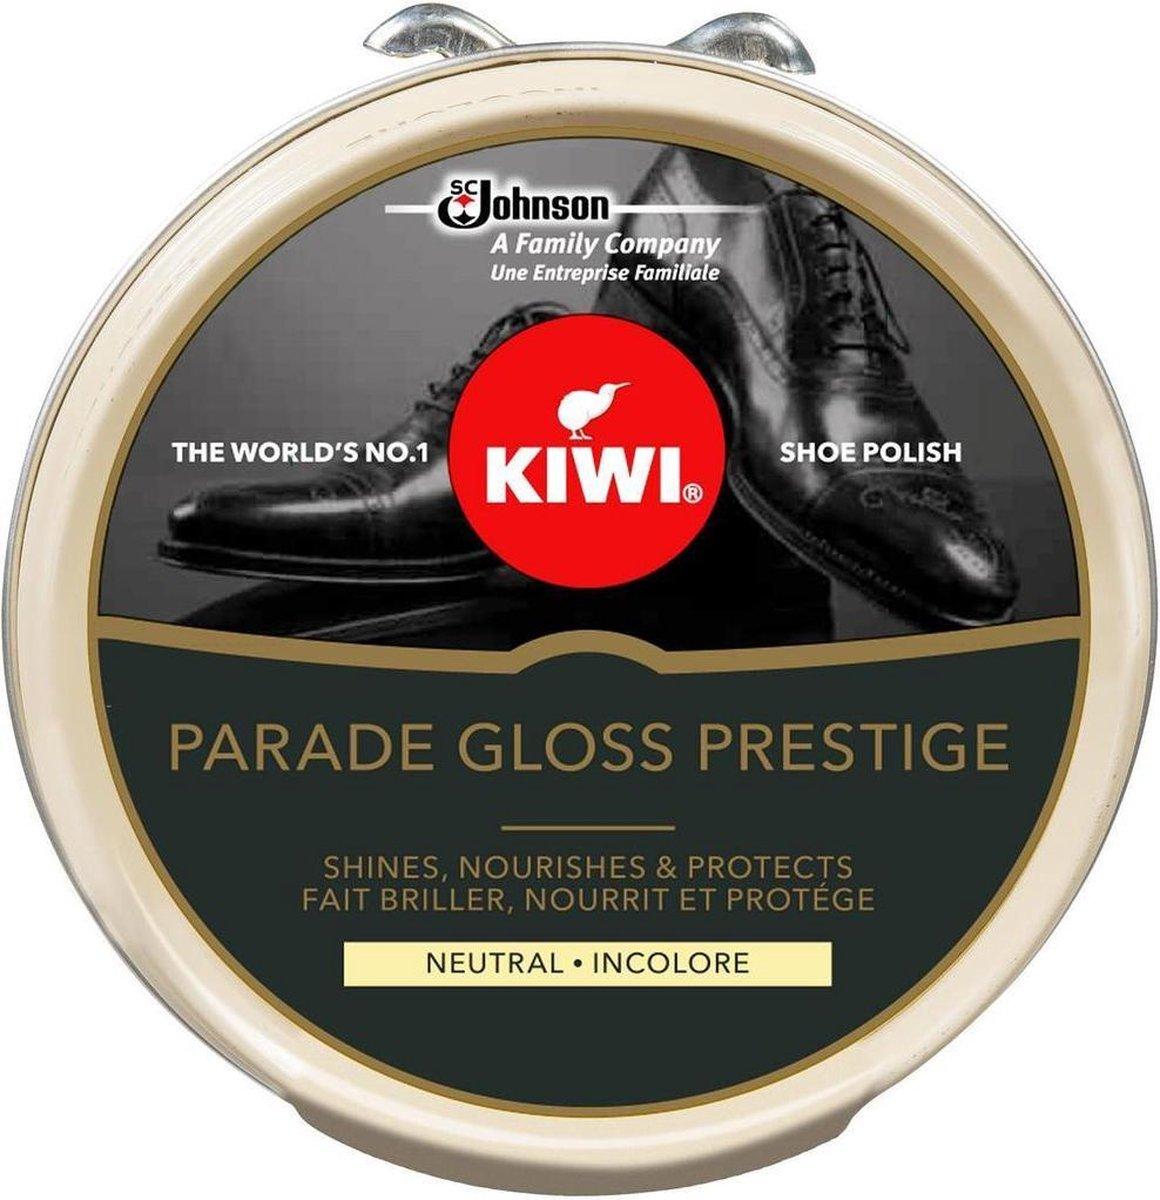 Kiwi Shoe Polish (schoensmeer) Kleur Kleurloos (Kiwi Neutral